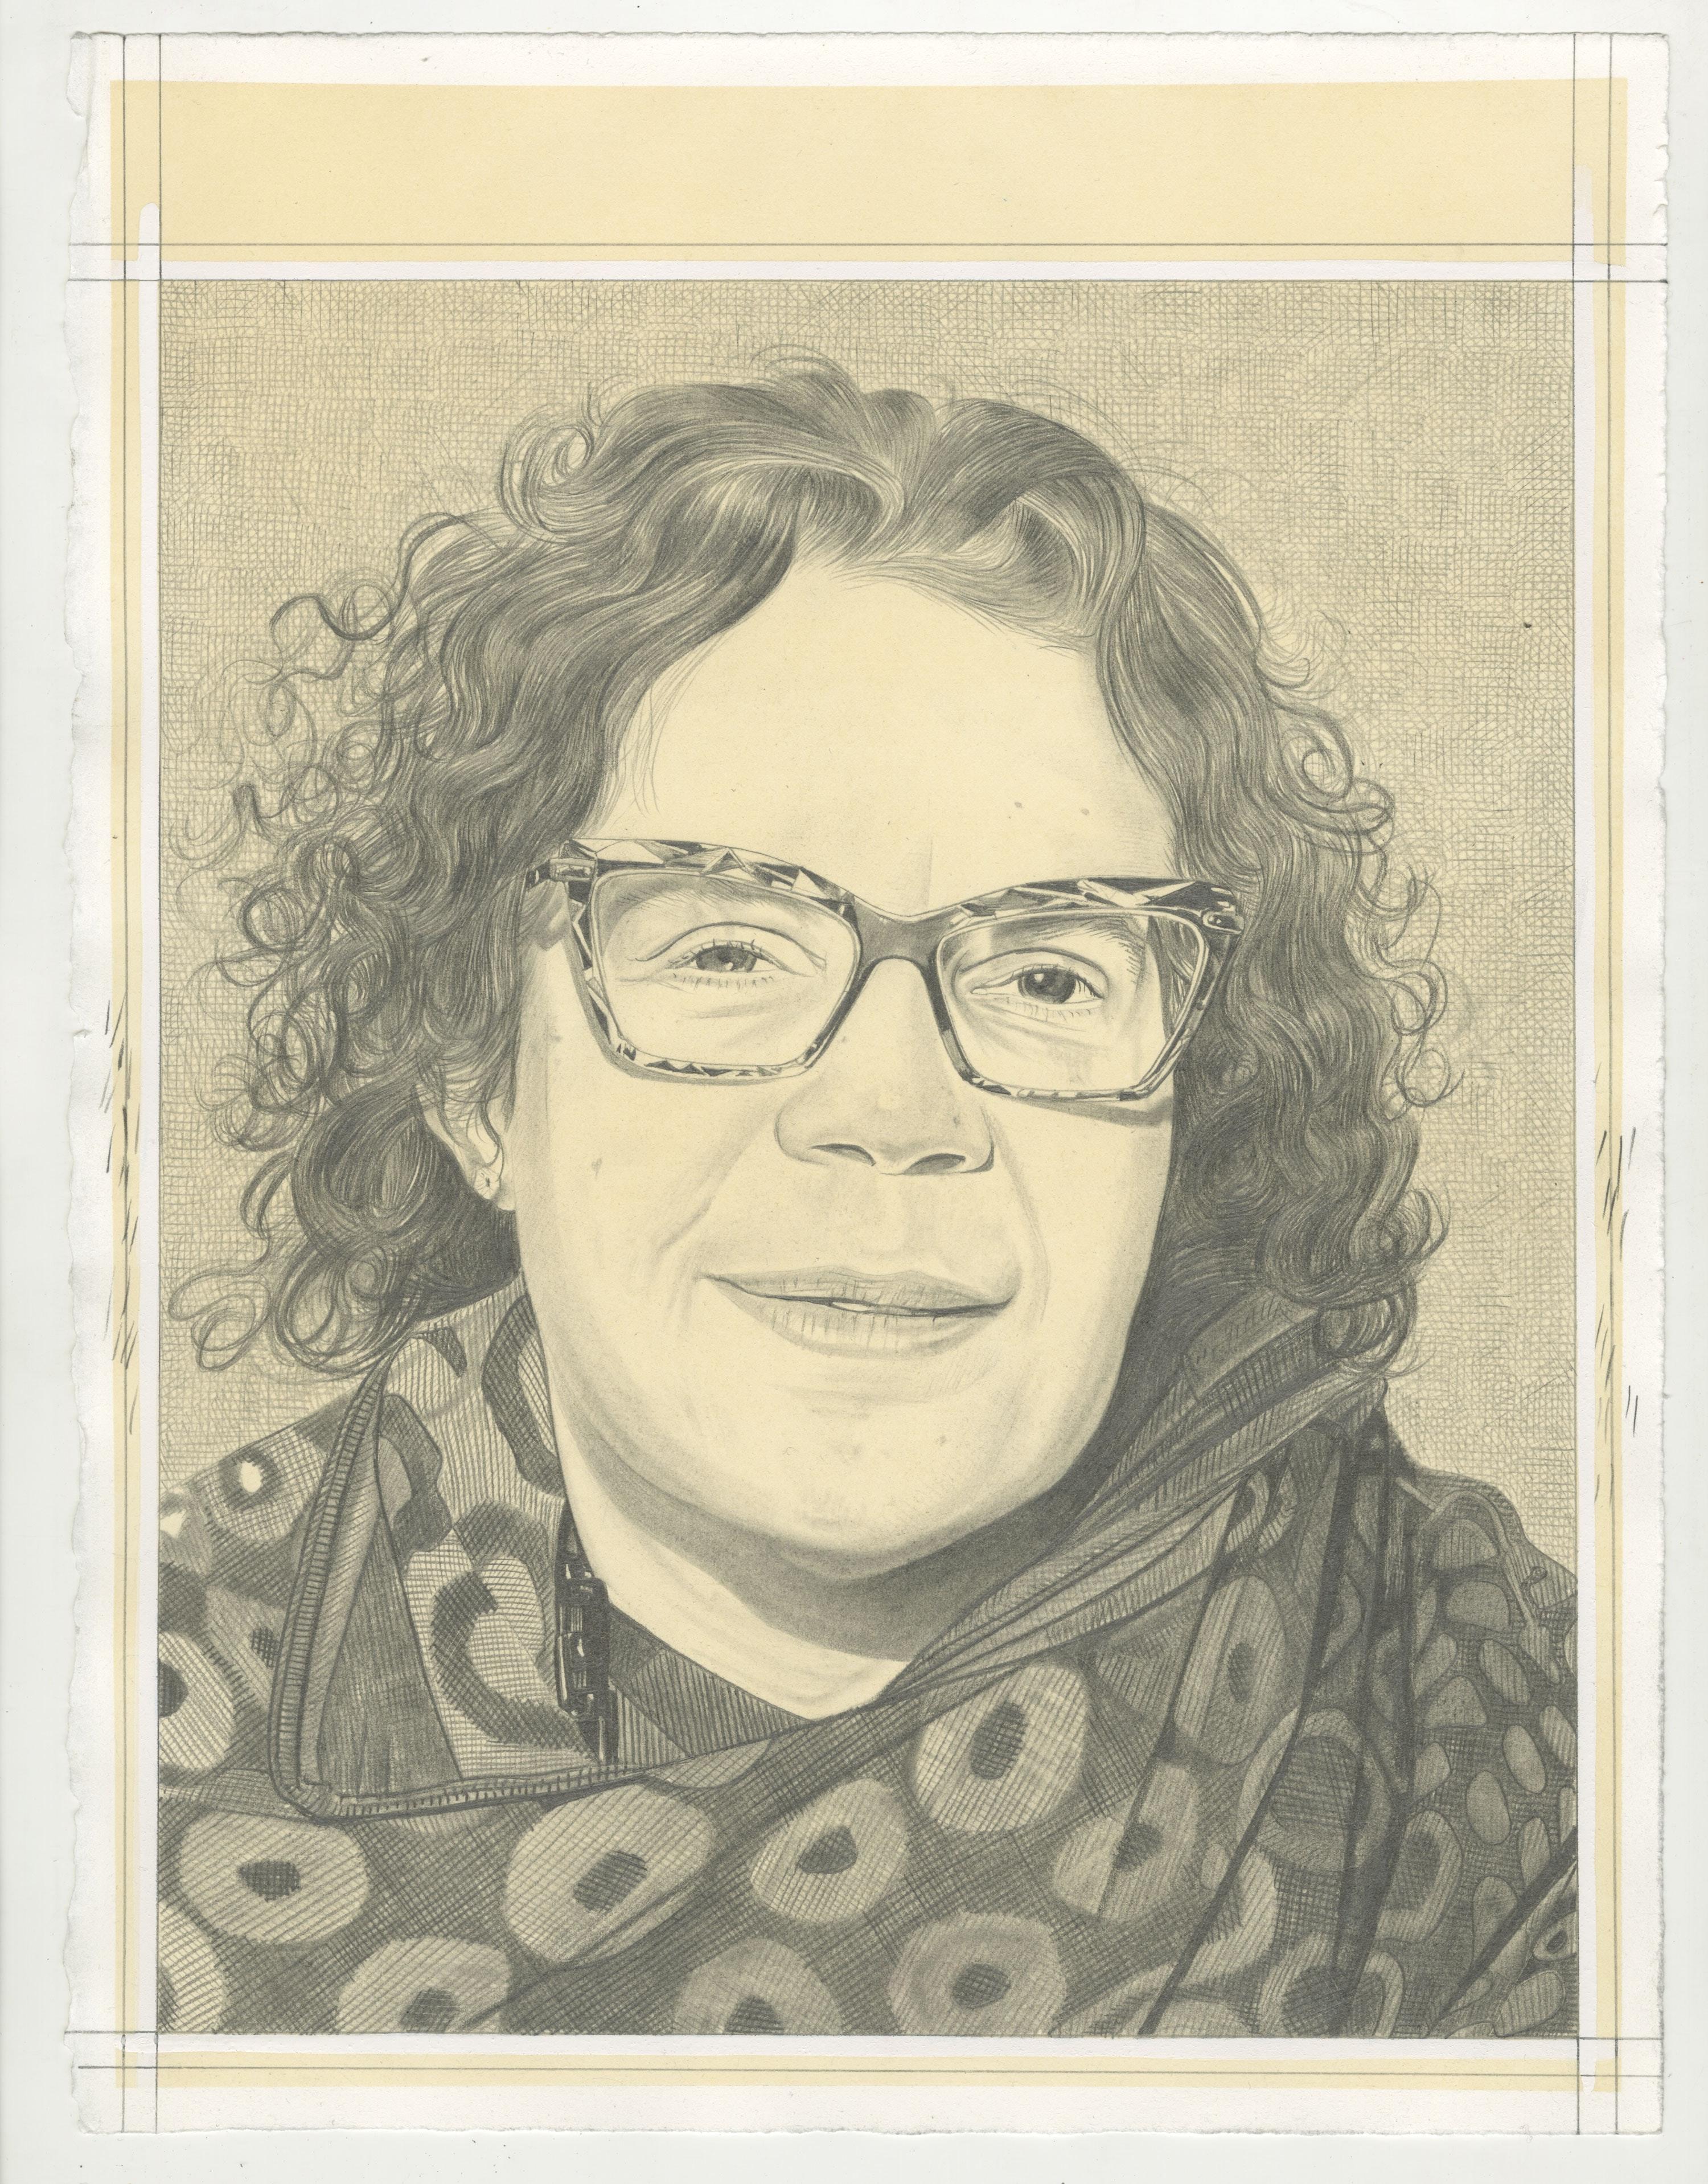 Portrait of Candida Alvarez, pencil on paper by Phong H. Bui.